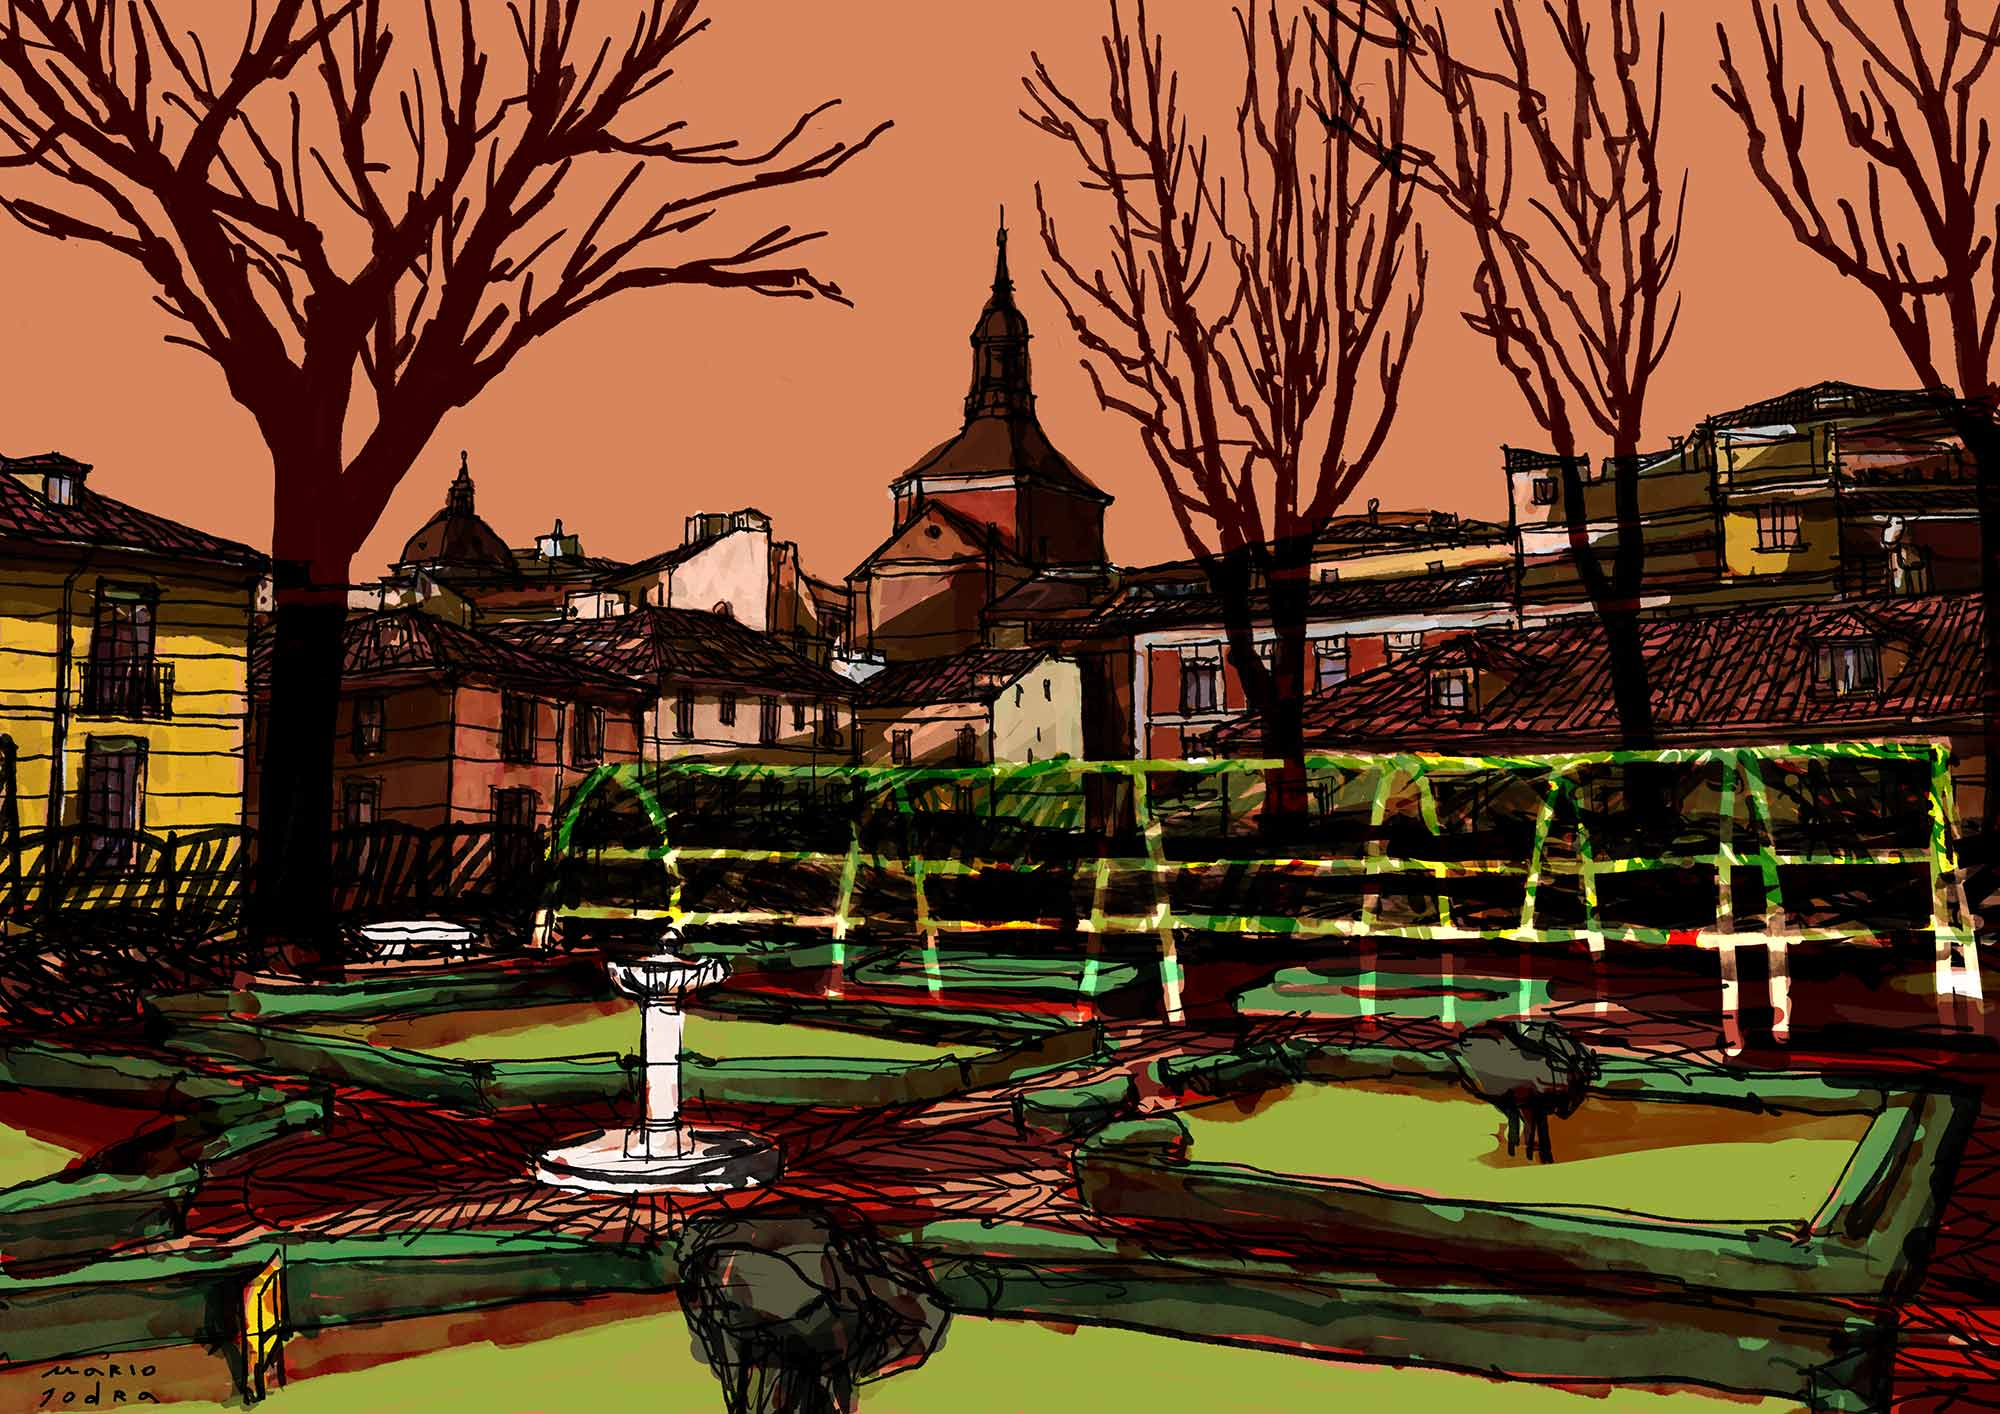 Mario Jodra illustration - Winter sunset at Prince of Anglona Garden (Madrid).